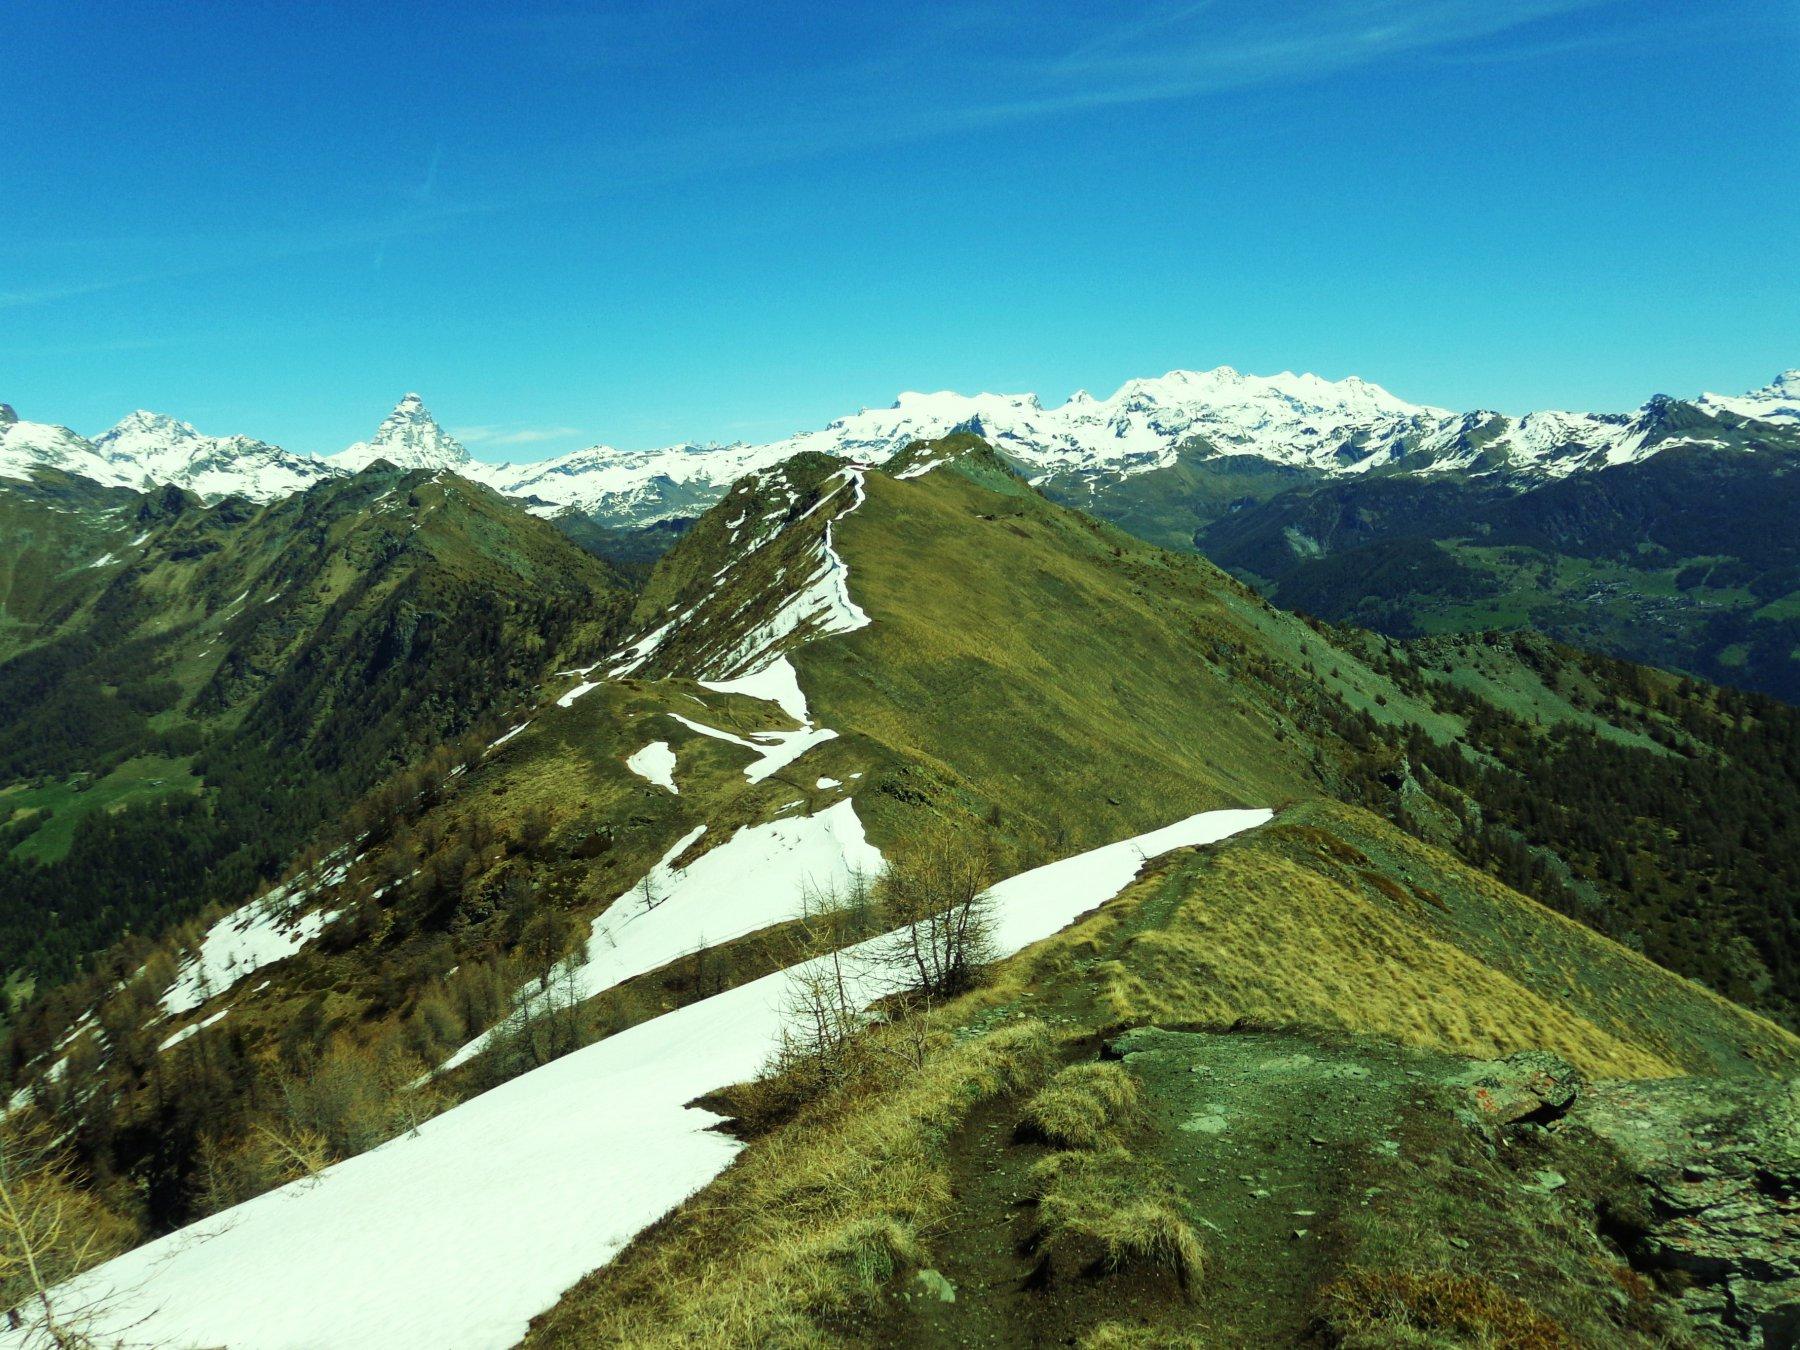 Sguardo verso la Becca d'Aver , Monte Rosa e Cervino da Cima Longhede